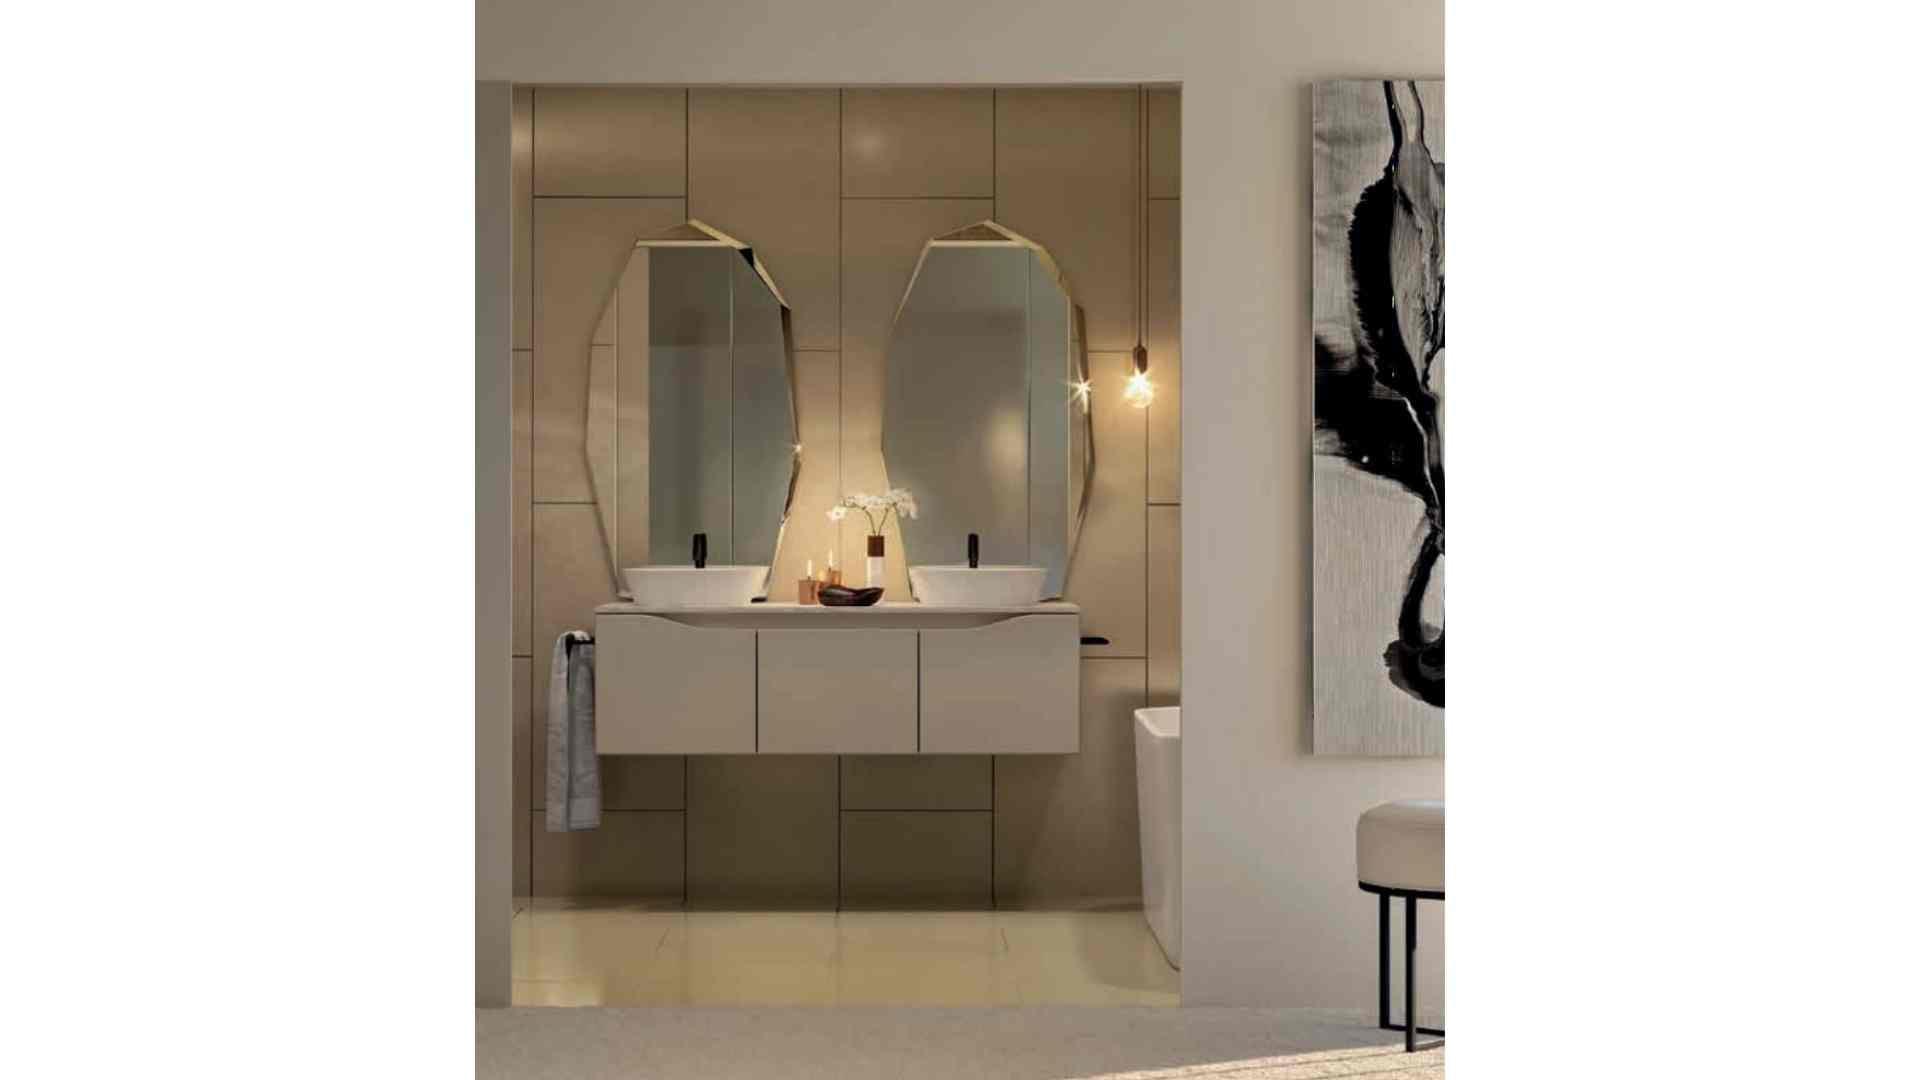 white and beige bathroom, black tap